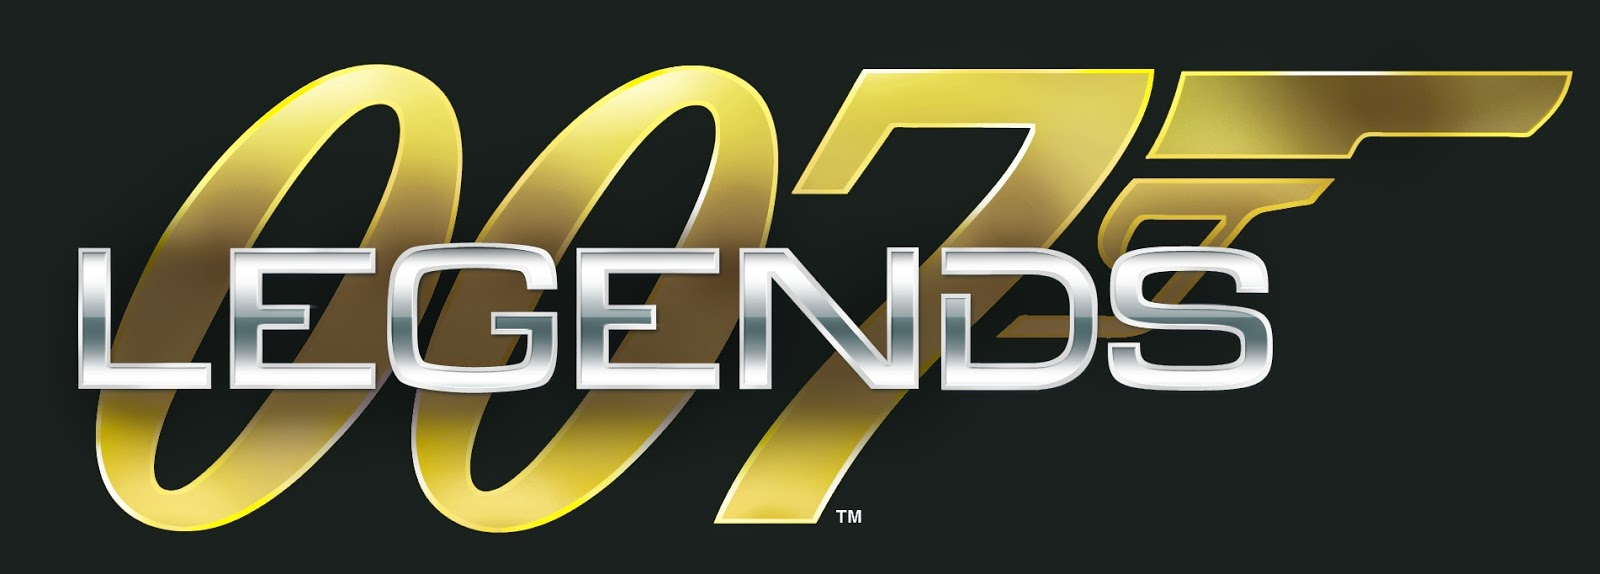 007 spy software 3 6 serial: